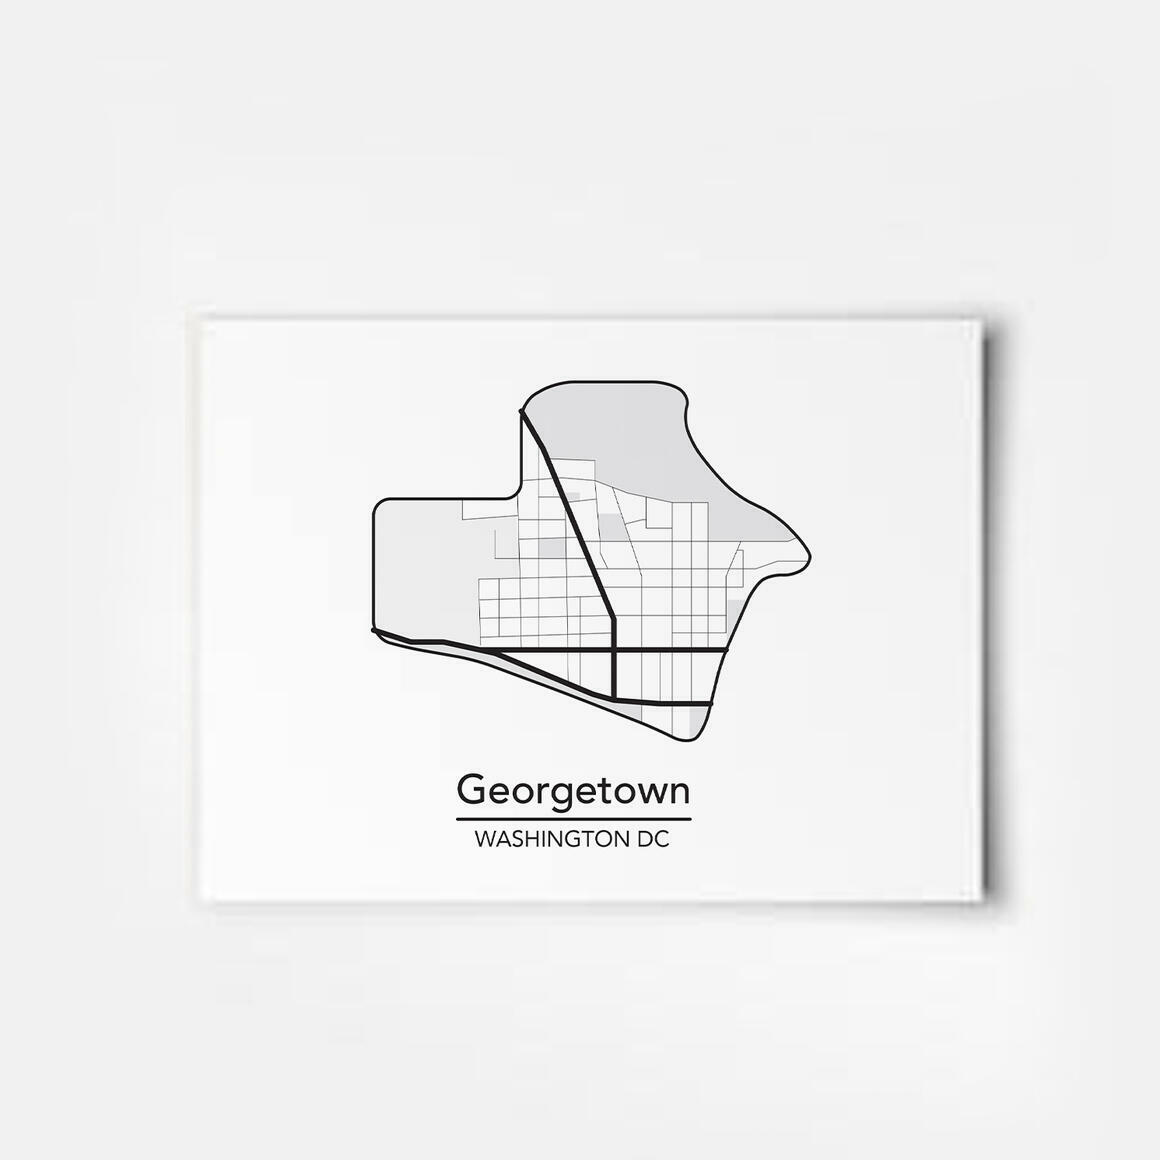 Georgetown - Washington DC Neighborhood Map Print | Trada Marketplace